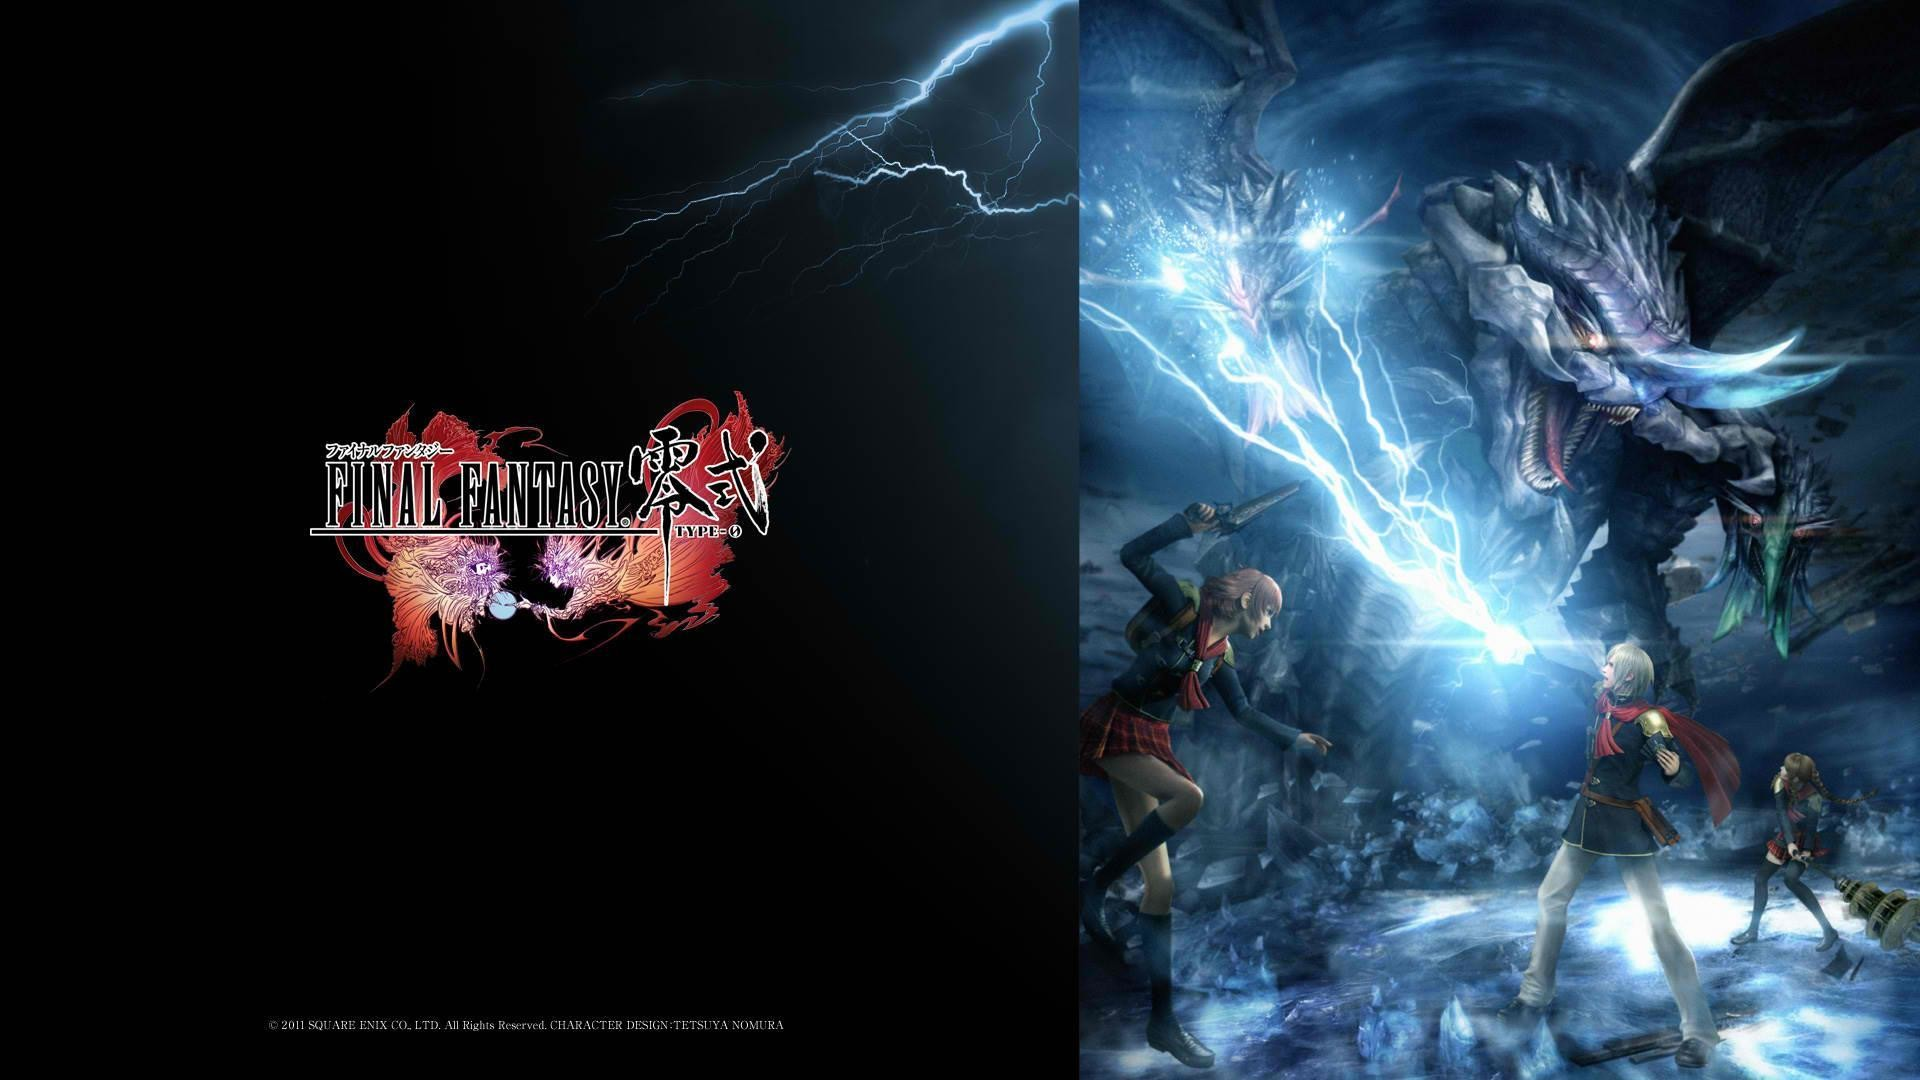 Wallpapers For > Final Fantasy 1 Wallpaper